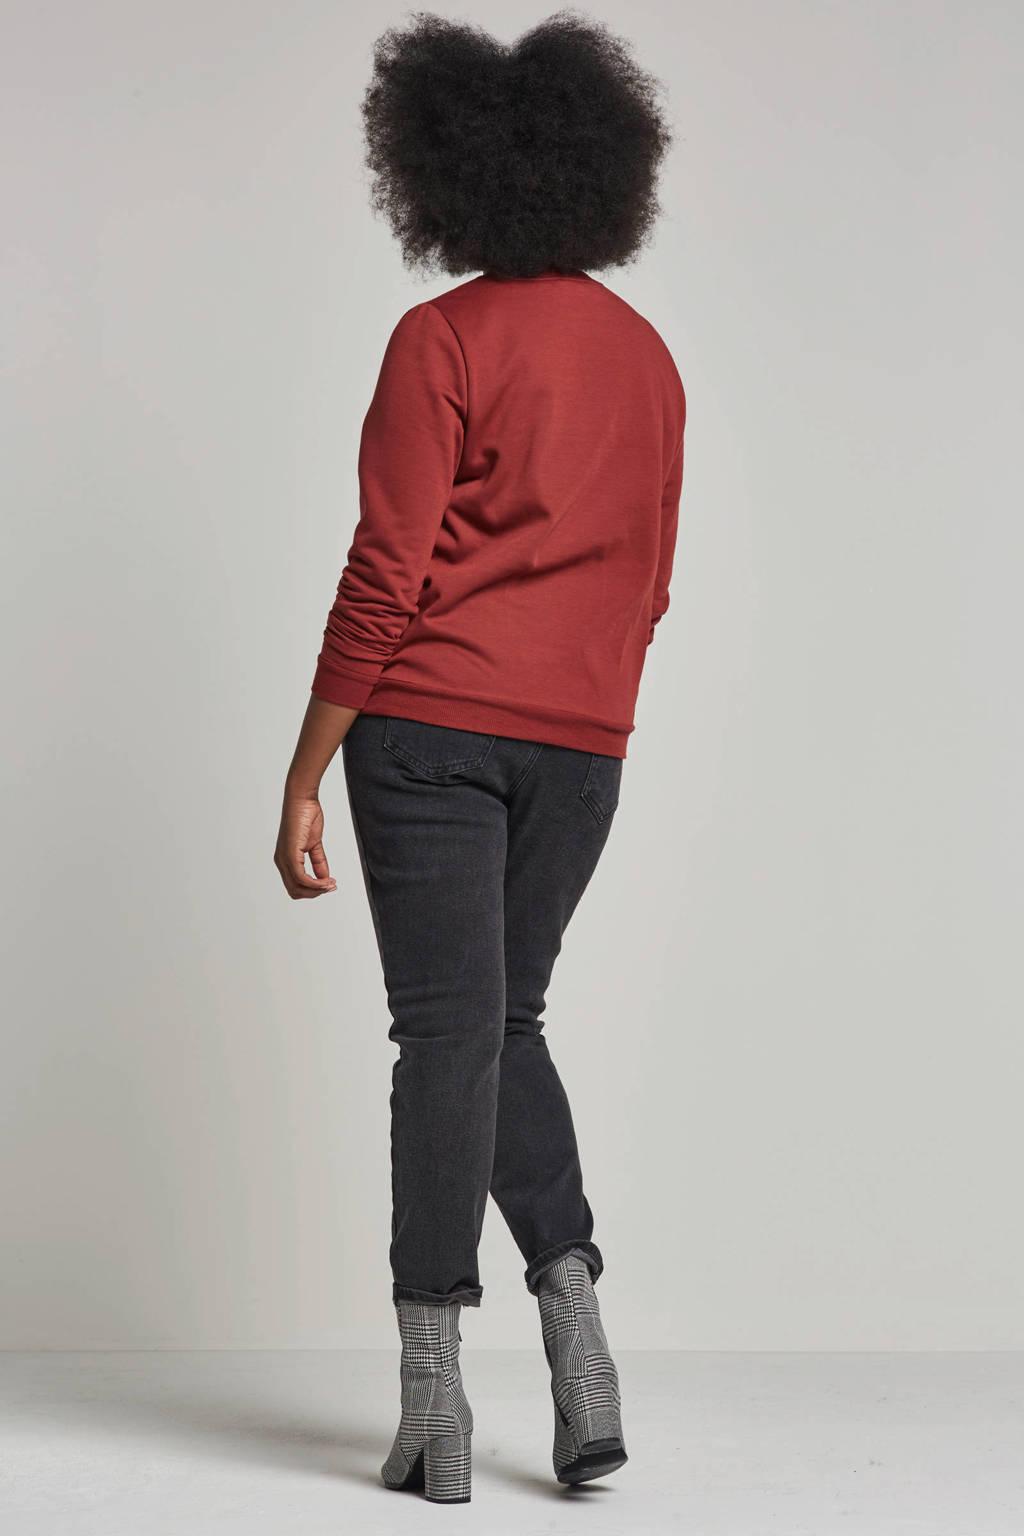 Whkmp's Tekst Met Met Whkmp's Lookssweater Great Lookssweater Great rqxCv0rw